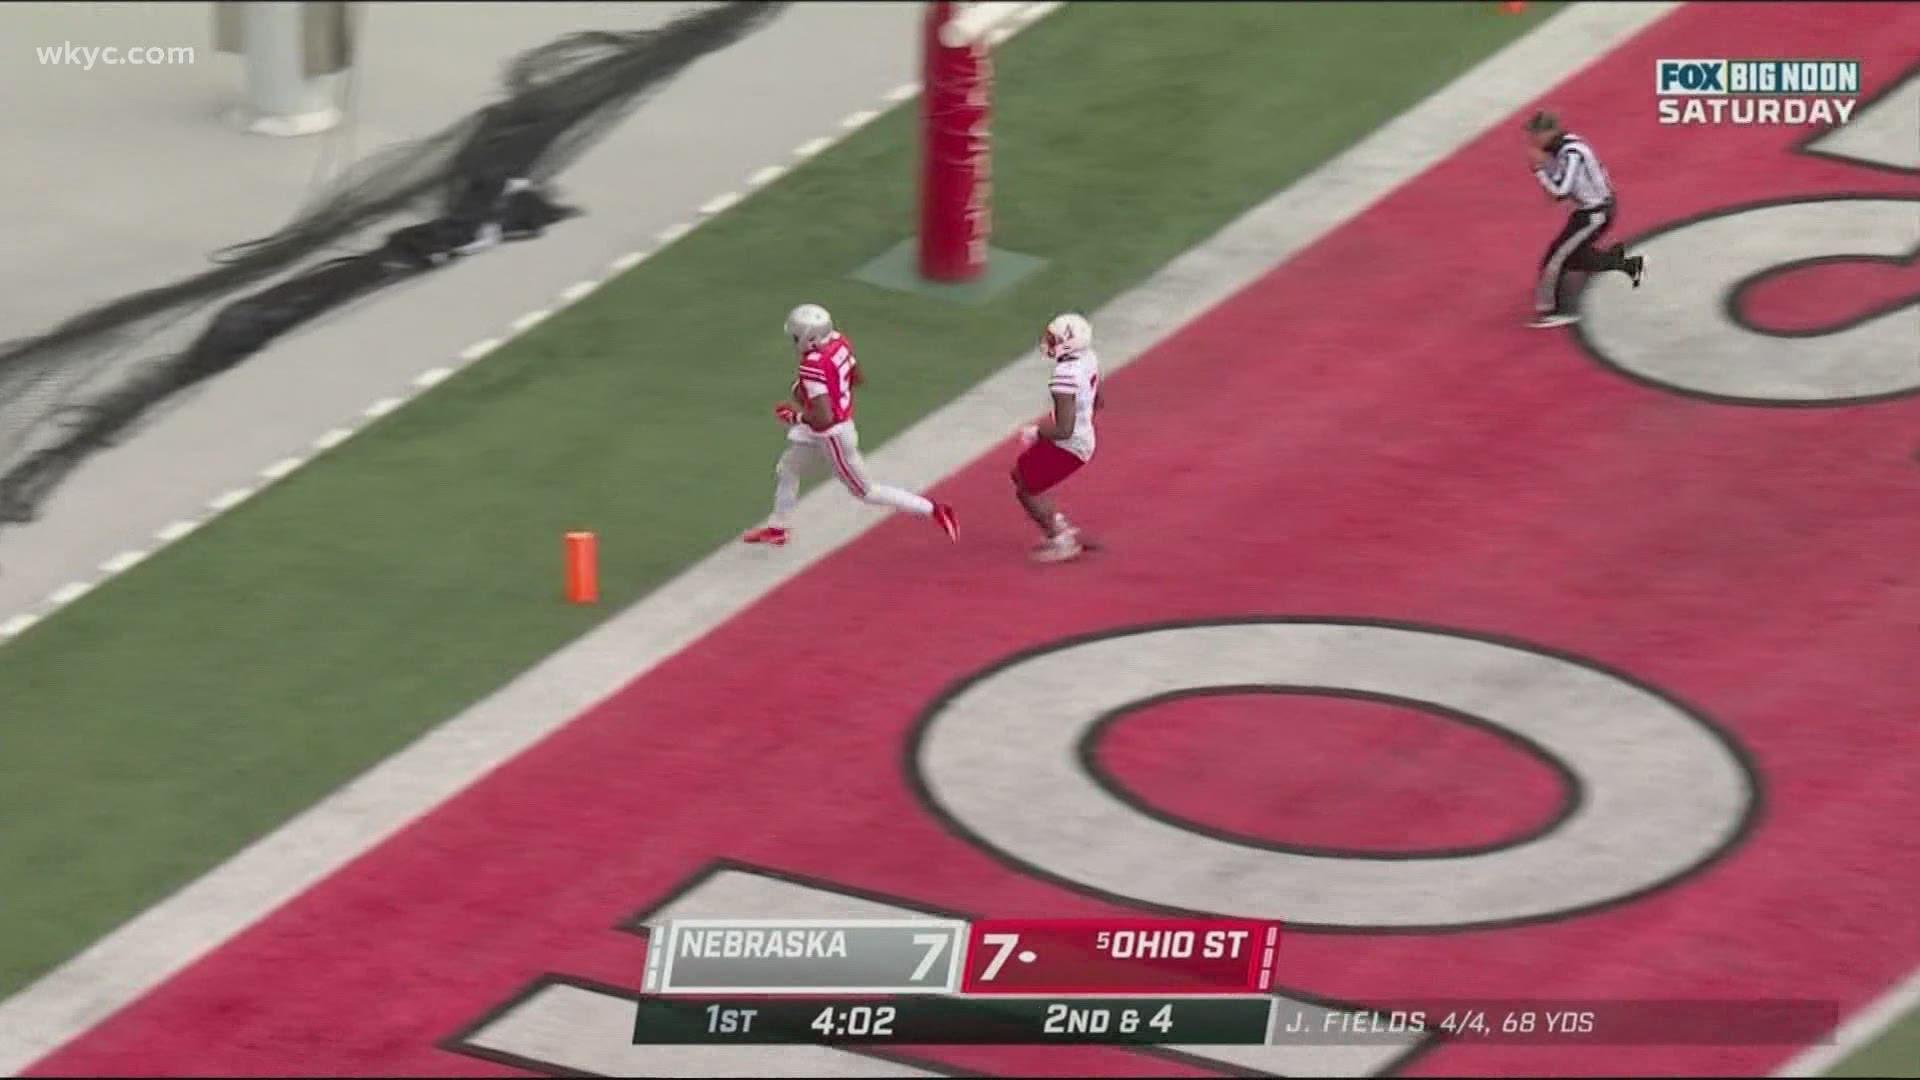 Ohio State dominates Nebraska in season opener | wkyc.com